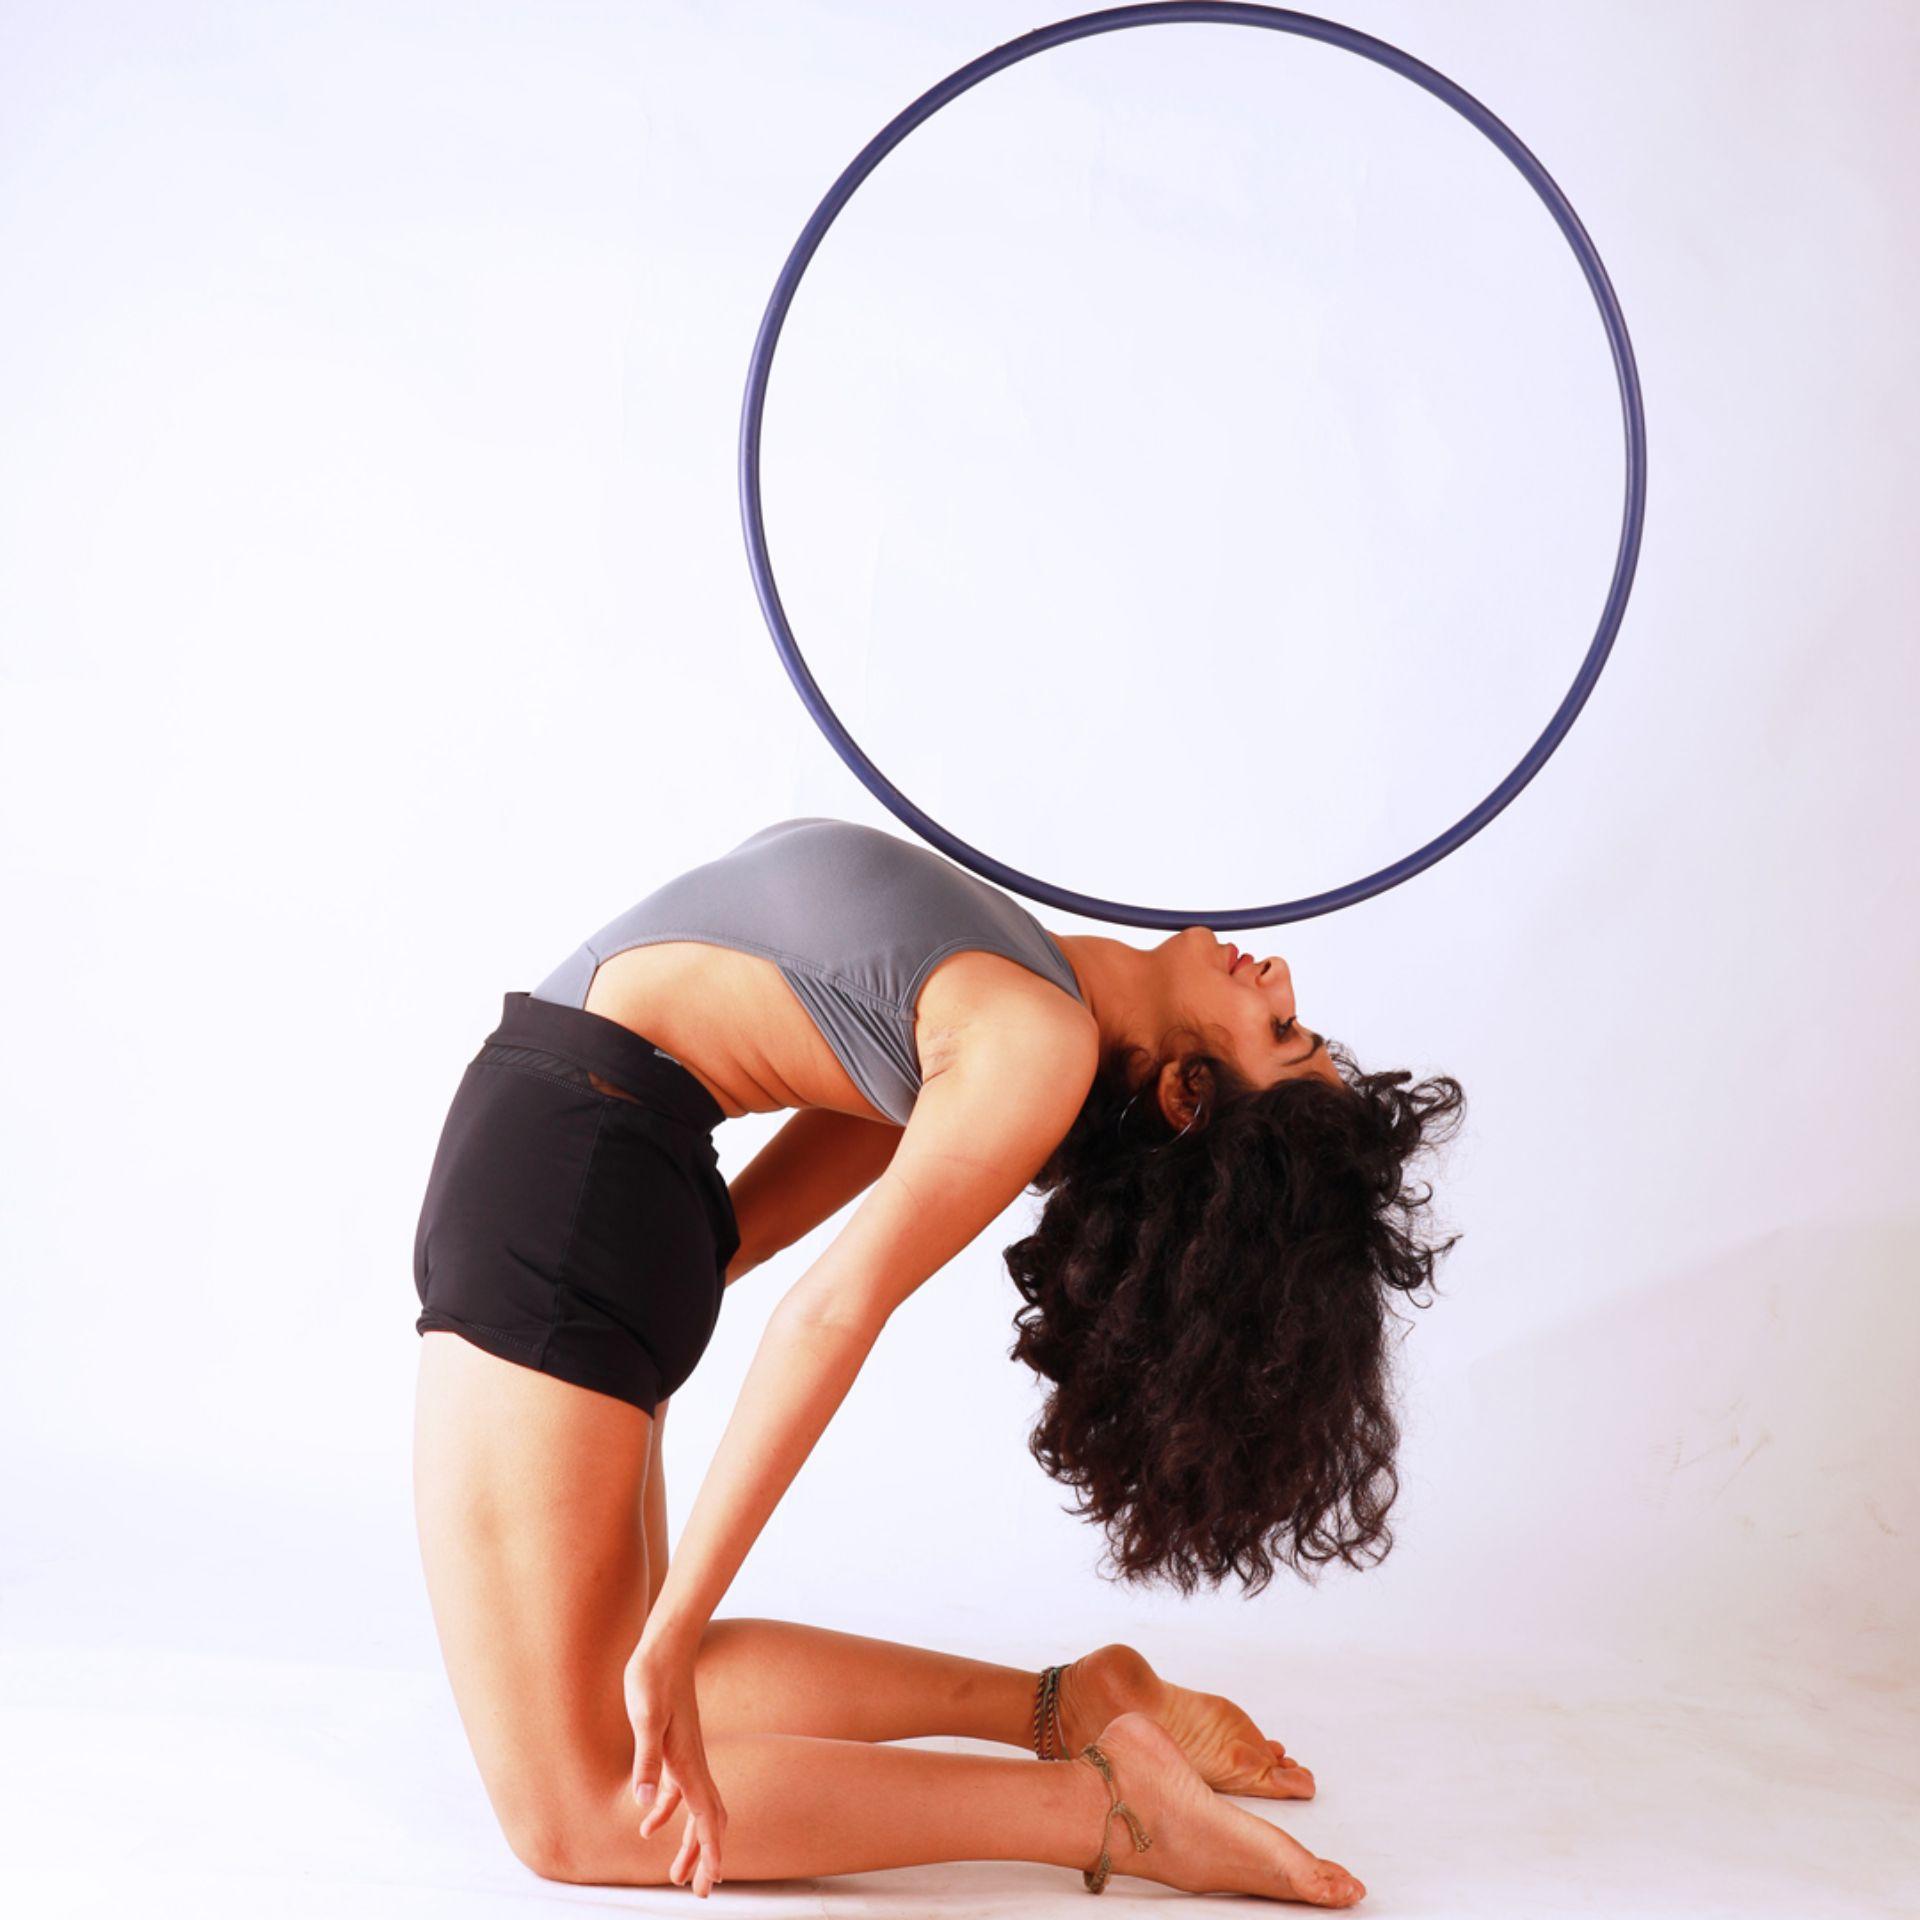 Hoop balance backbend flexibility dance portrait white background